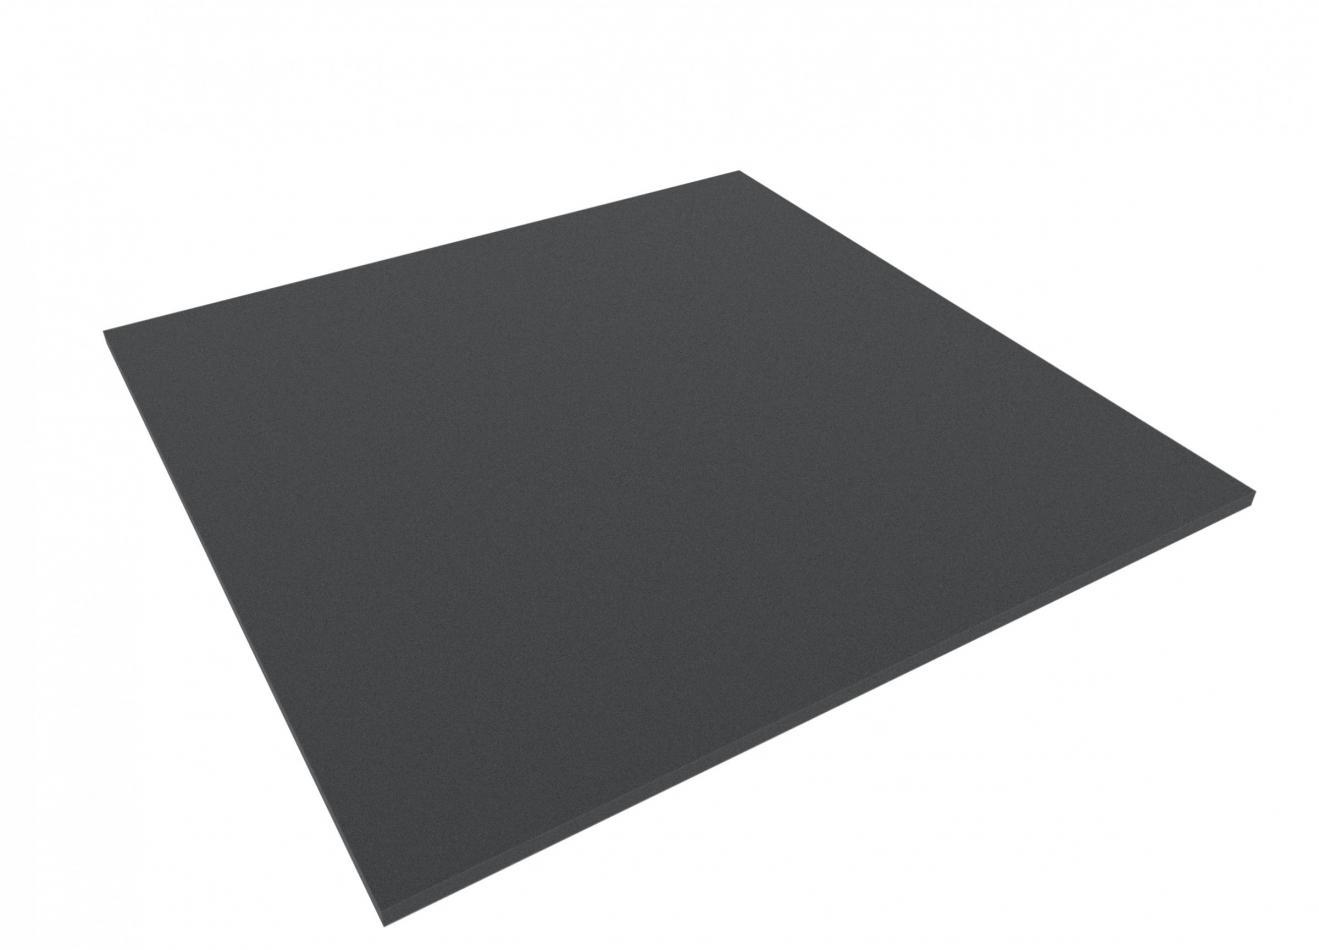 1000 mm x 1000 mm x 10 mm foam sheet